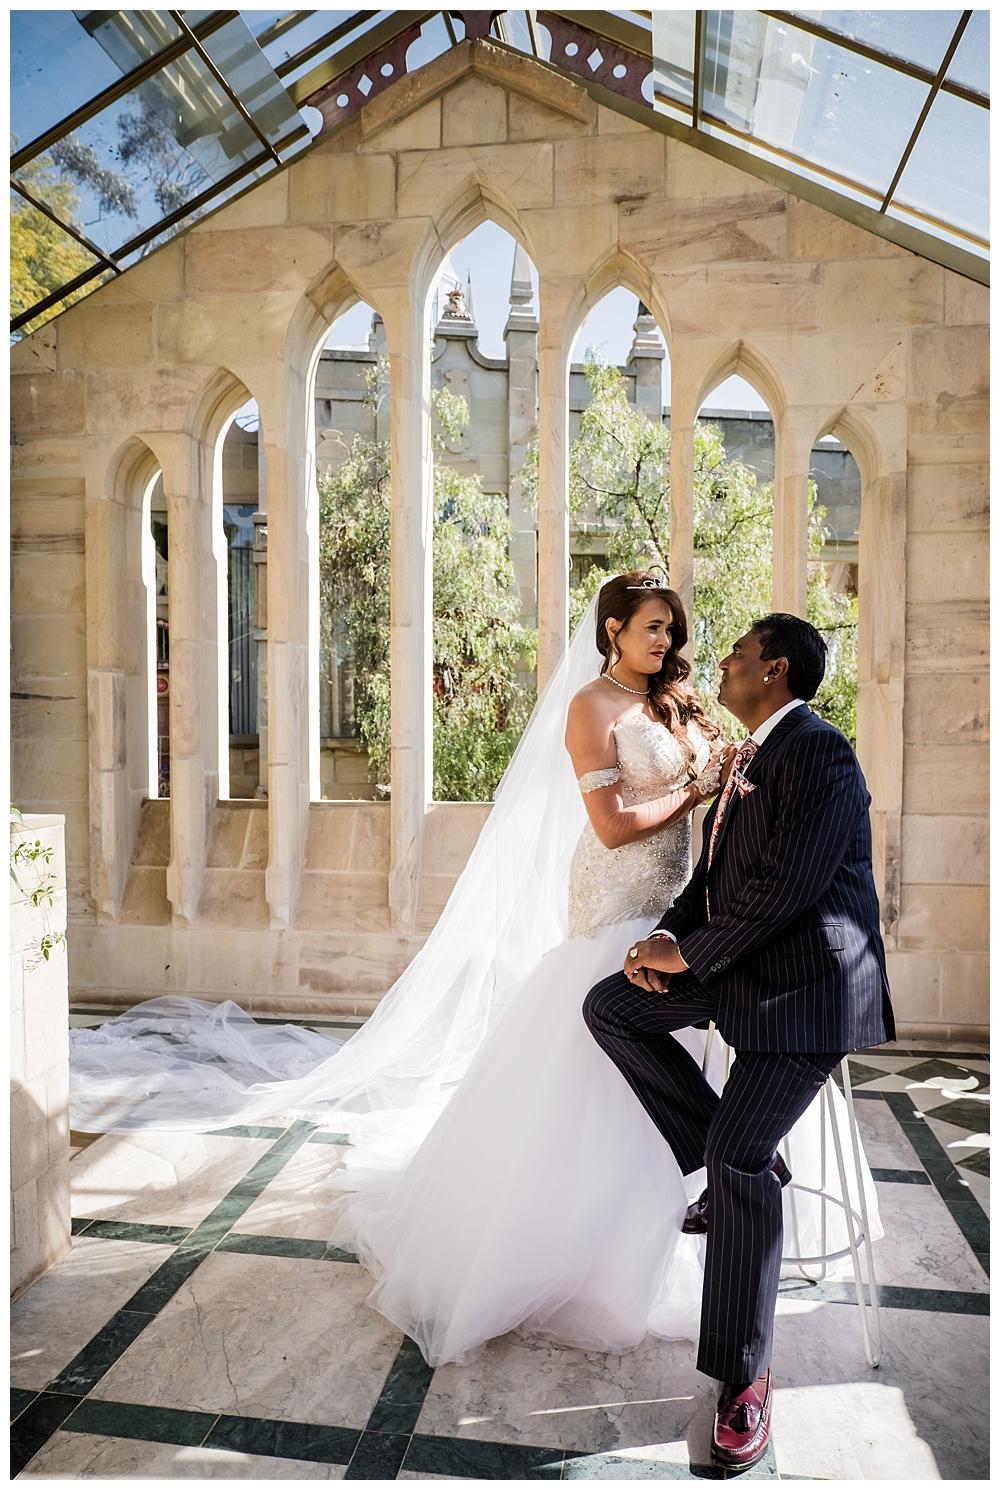 Best_Wedding_Photographer_AlexanderSmith_1858.jpg